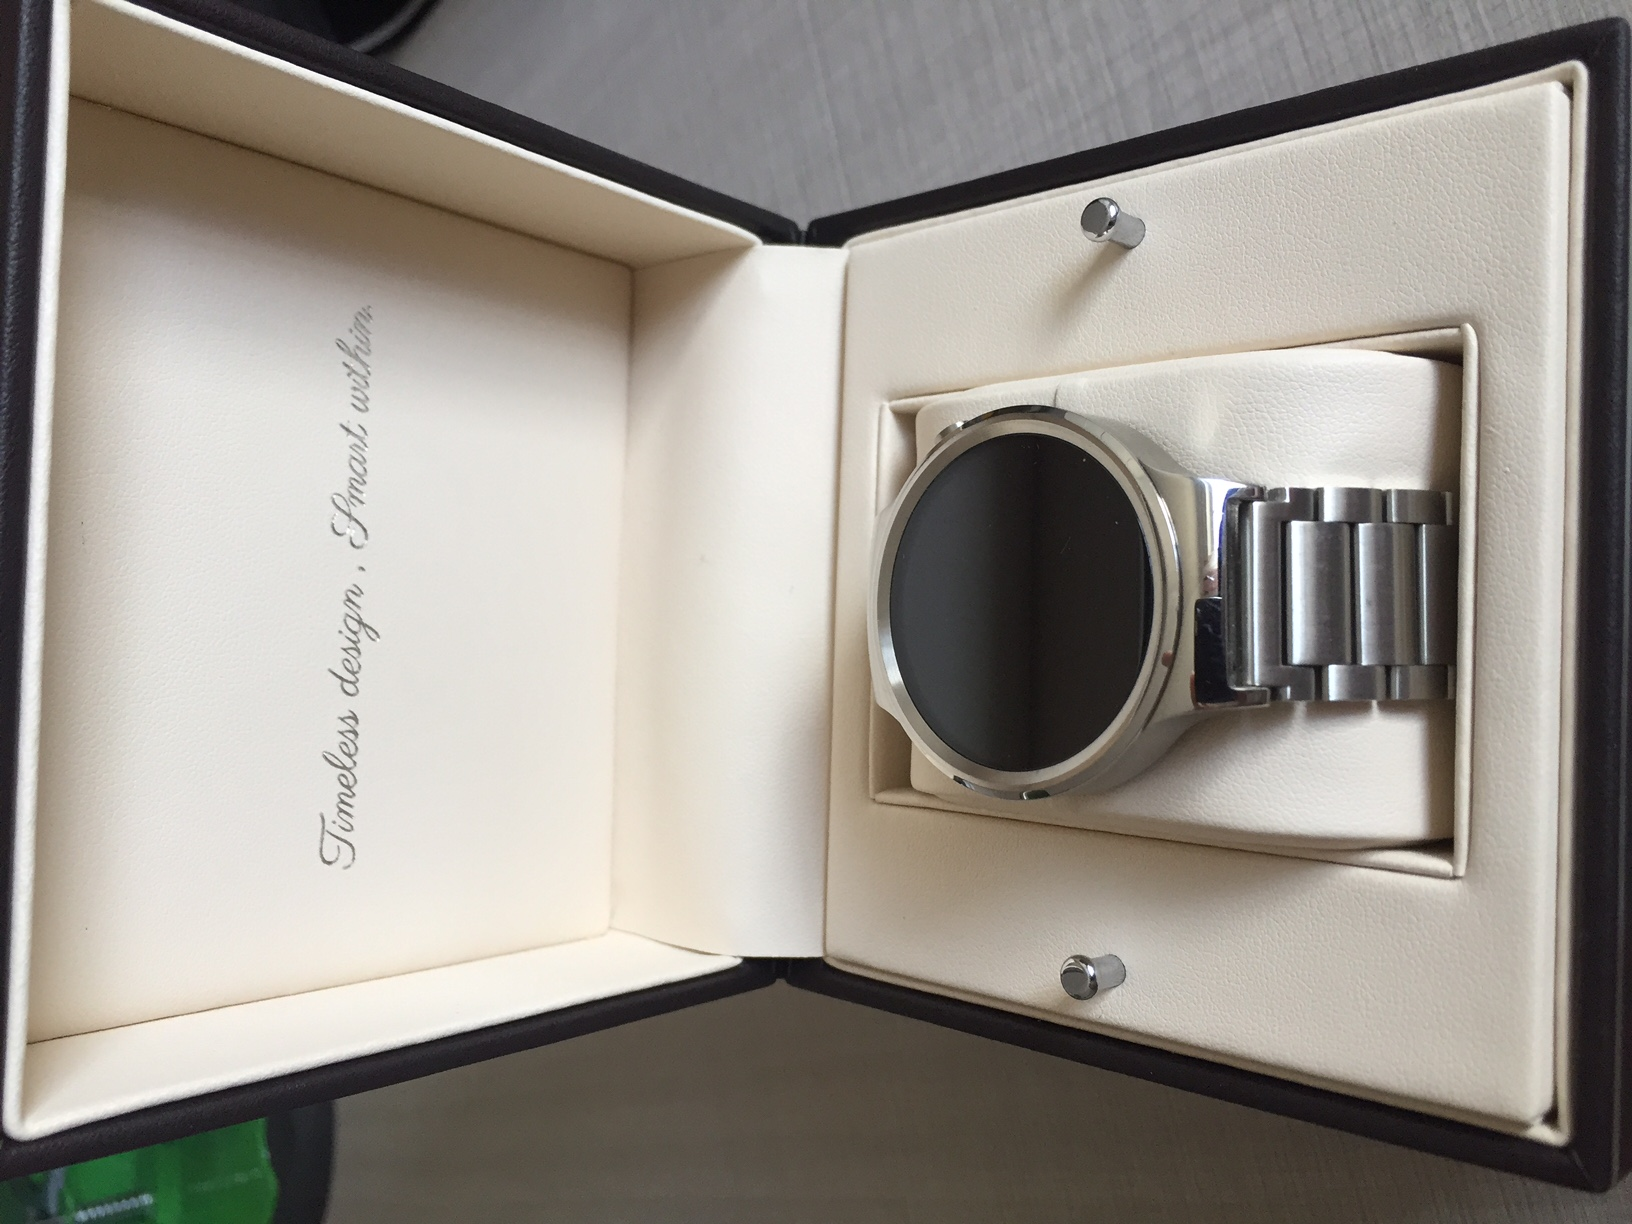 erledigt huawei smartwatch full package inkl rechnung. Black Bedroom Furniture Sets. Home Design Ideas